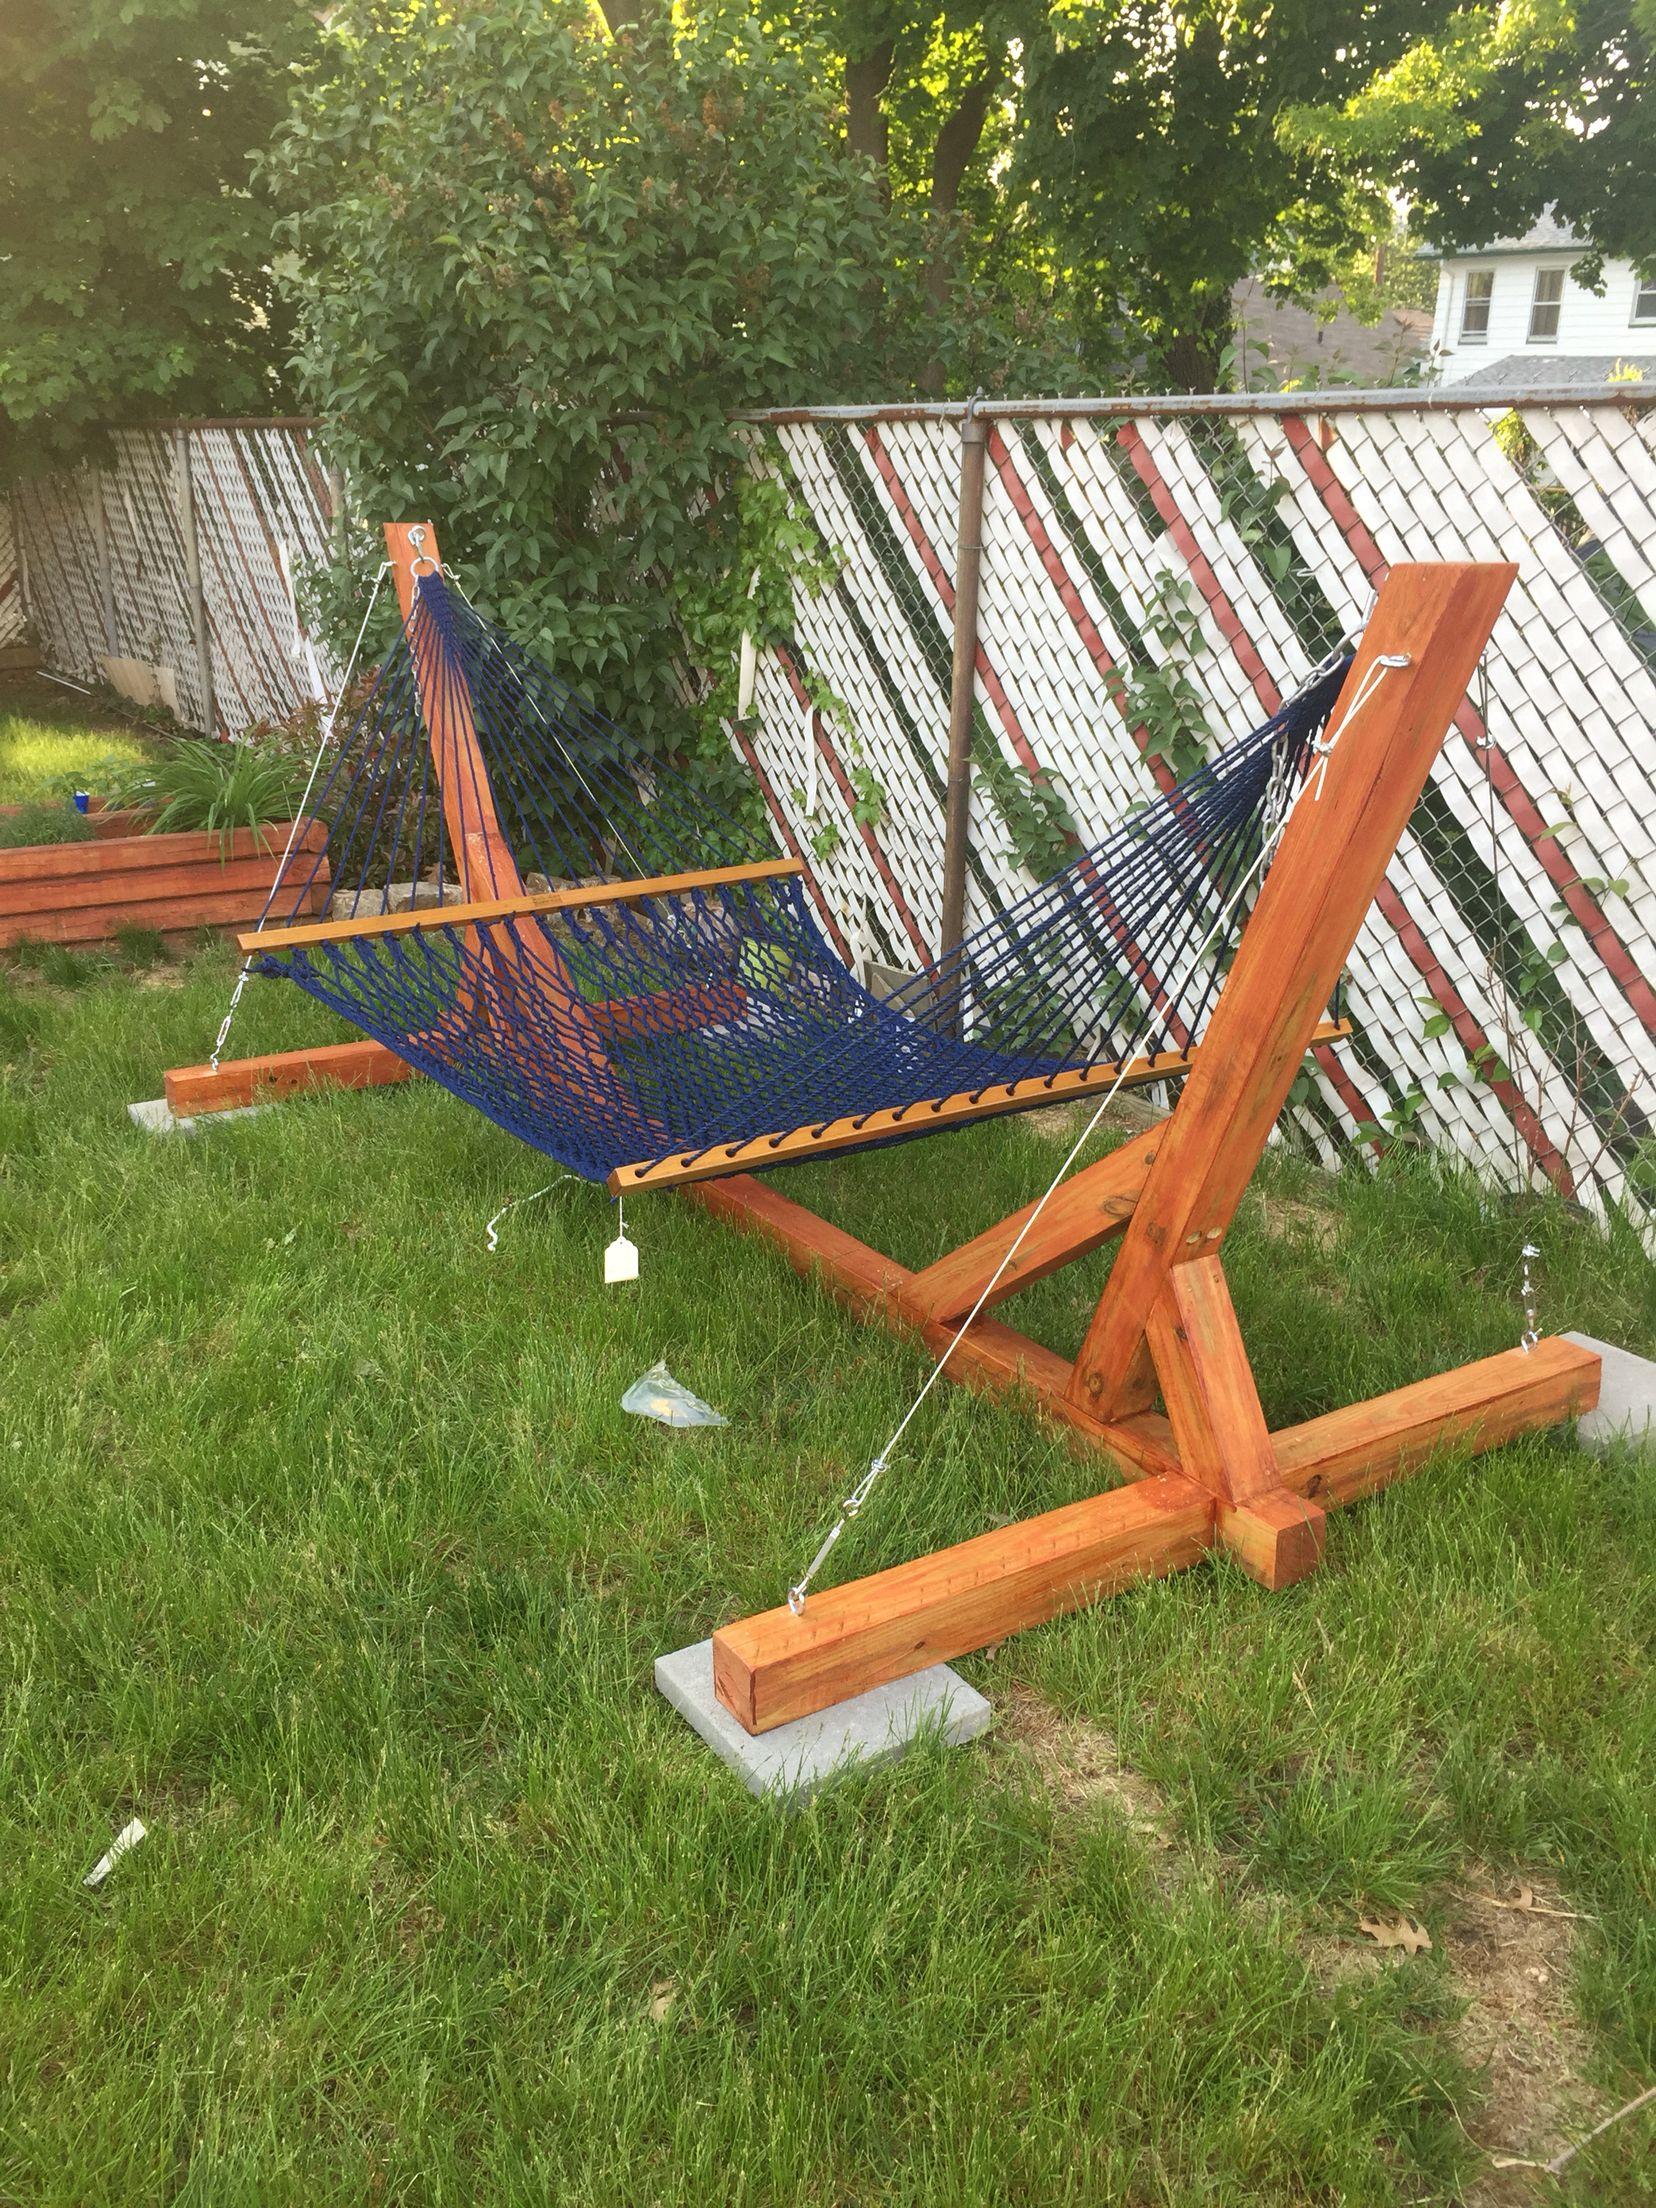 Diy Hammock Stand Plans Best Chair In 2020 Diy Hammock Backyard Hammock Diy Backyard